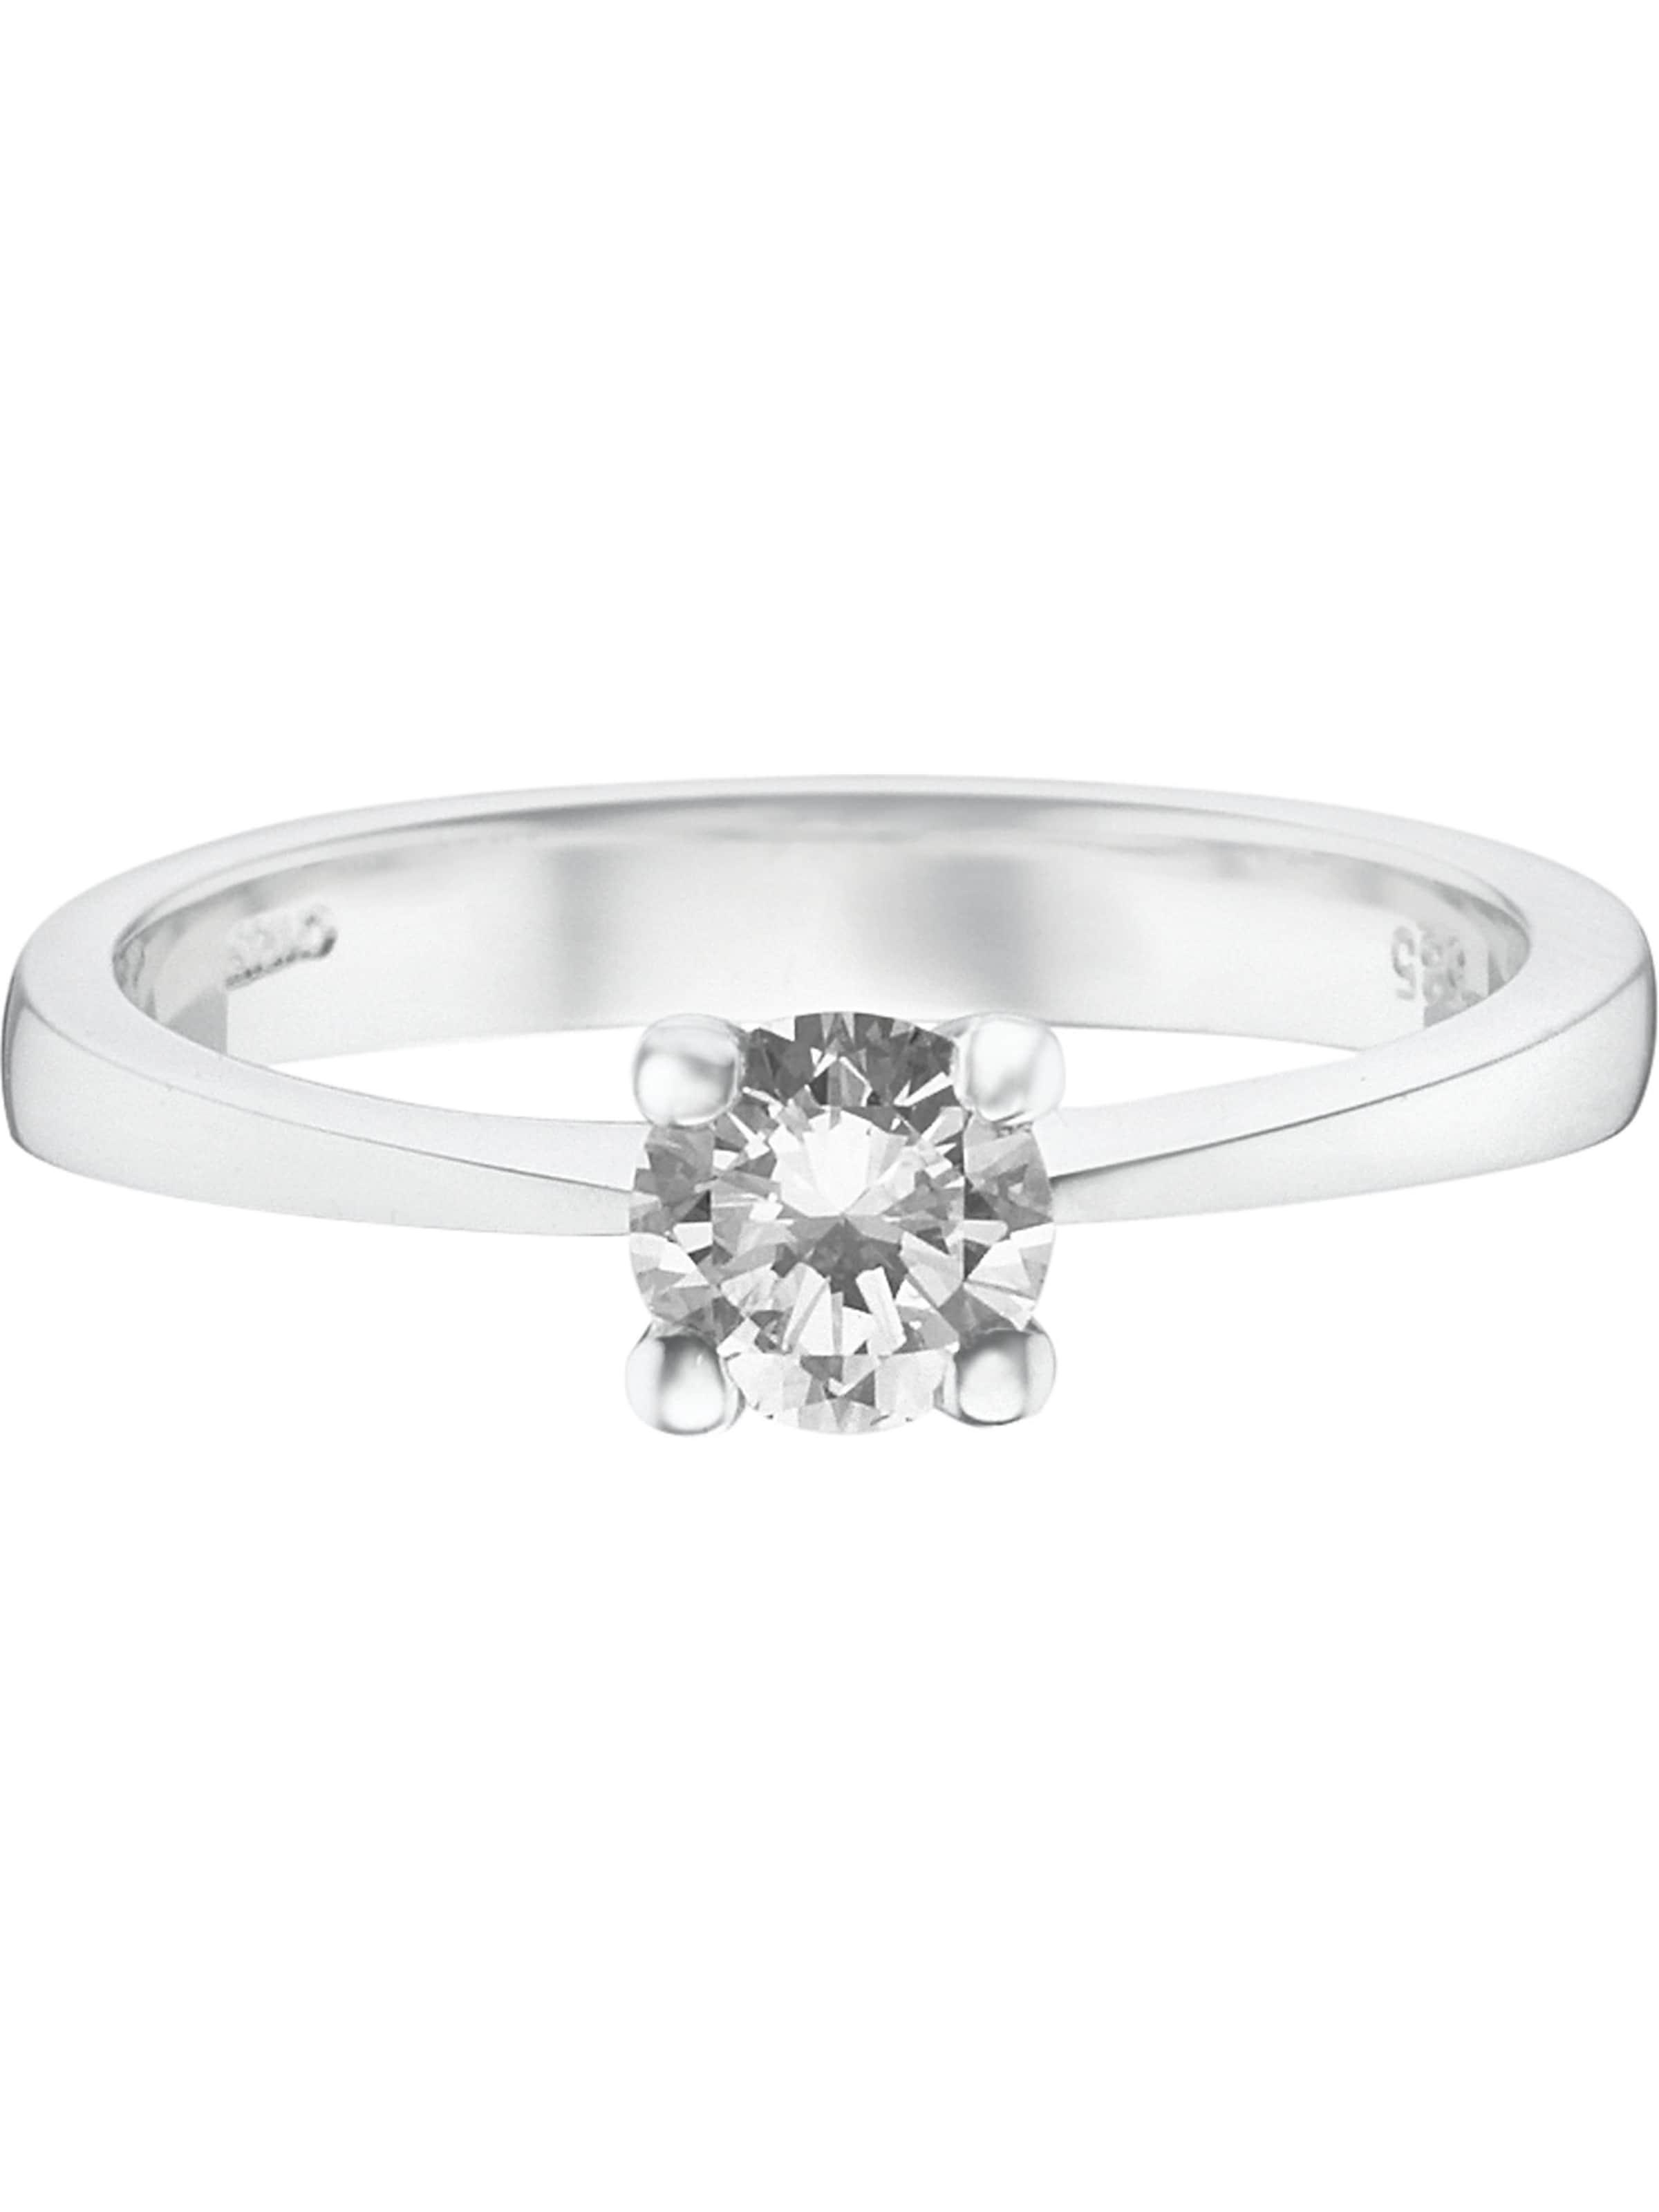 Ring In In Silber Silber Ring In Christ Ring Silber Ring Christ Christ Christ 80mNvnw